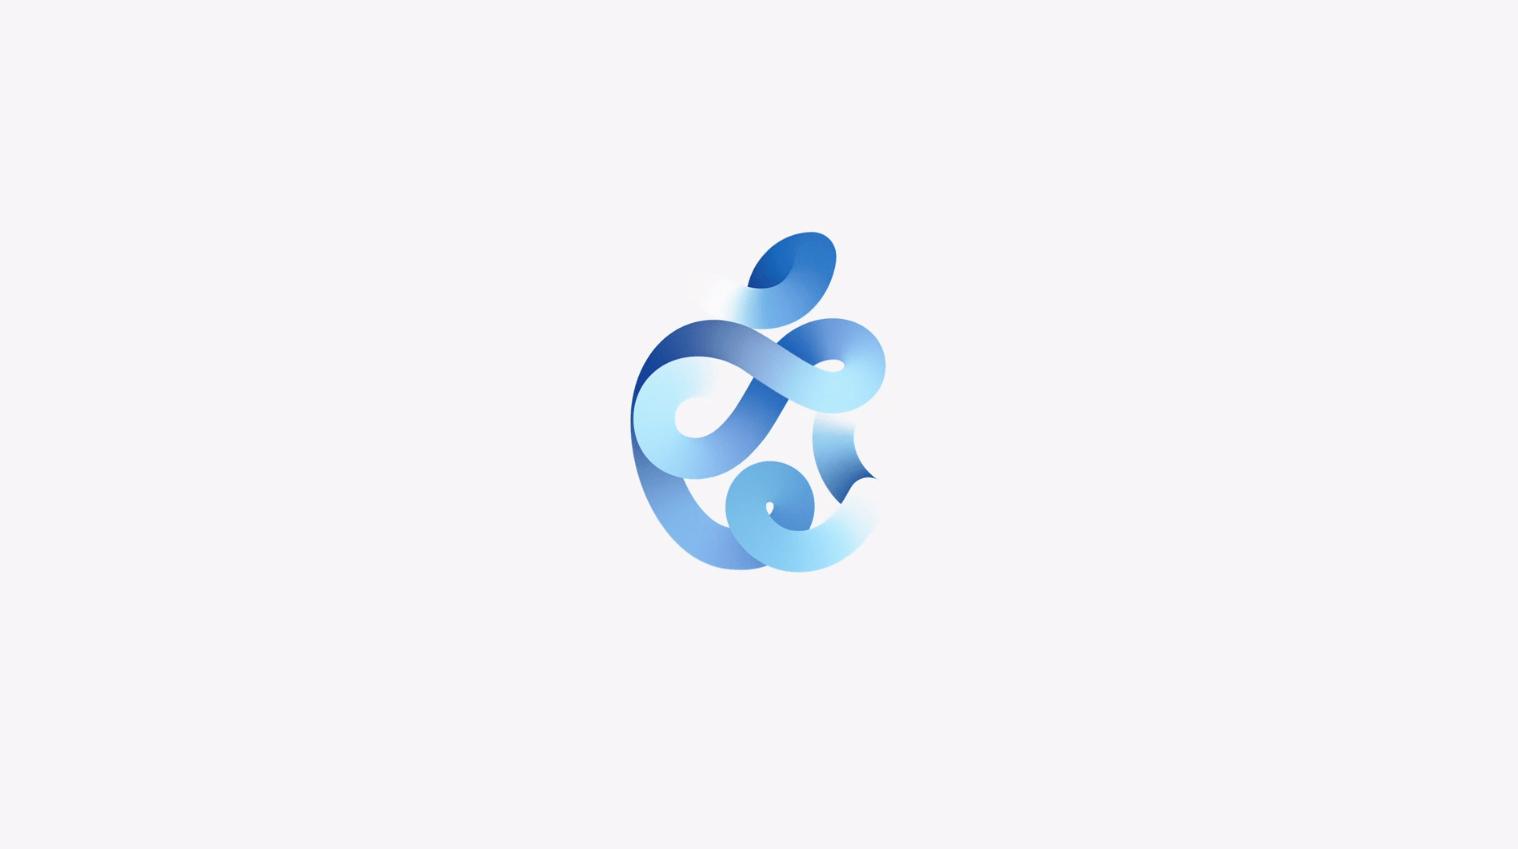 Evento Apple 2020